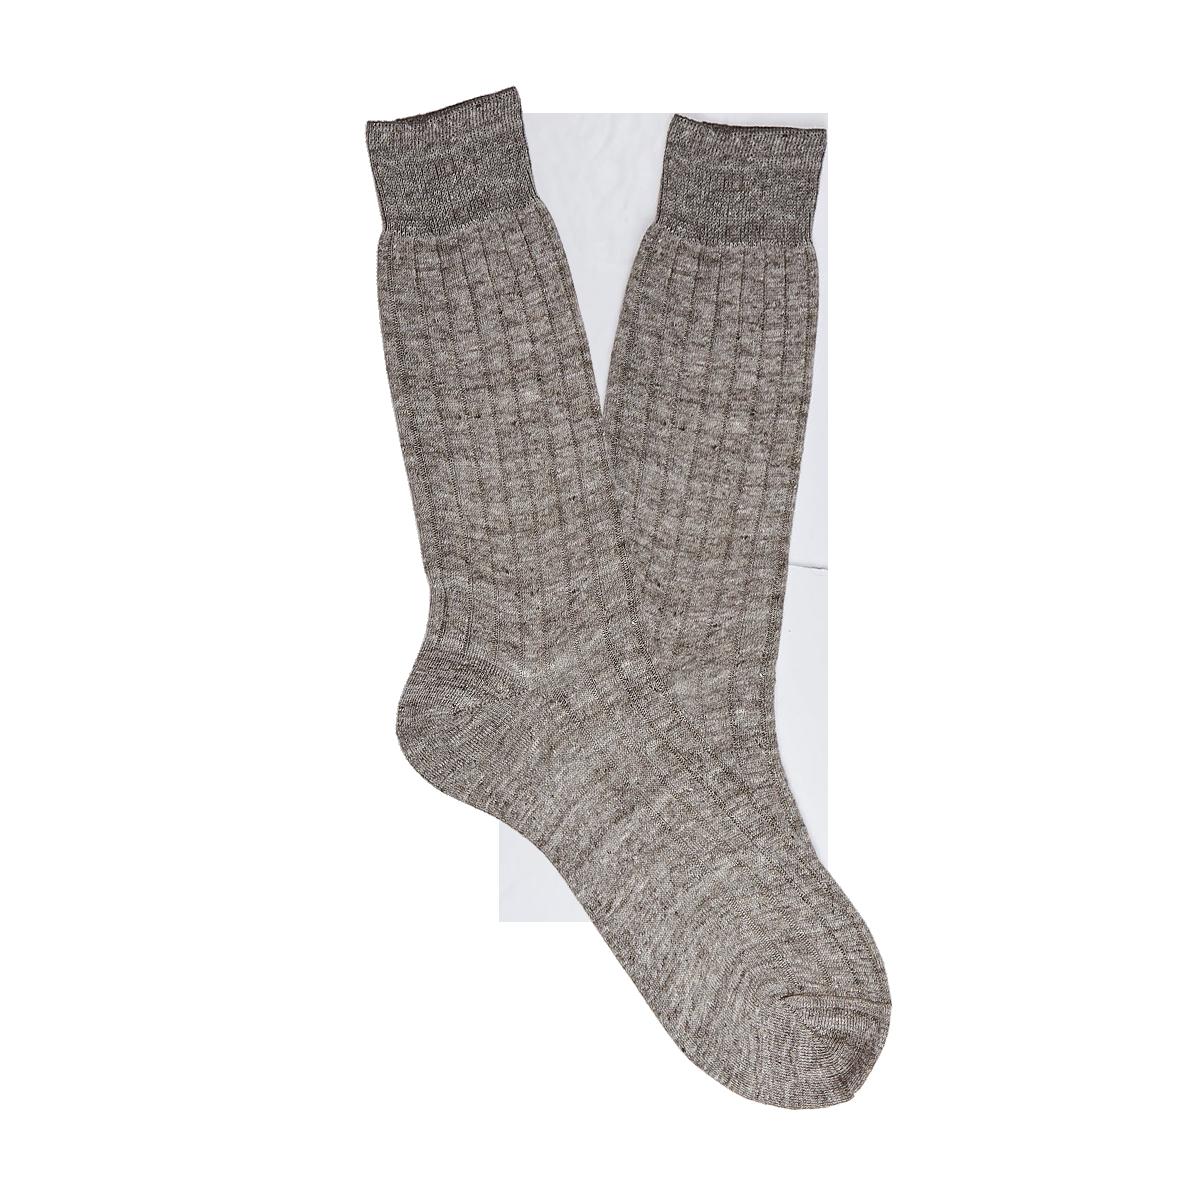 Bresciani Brown Melange Ribbed Linen Socks Feature